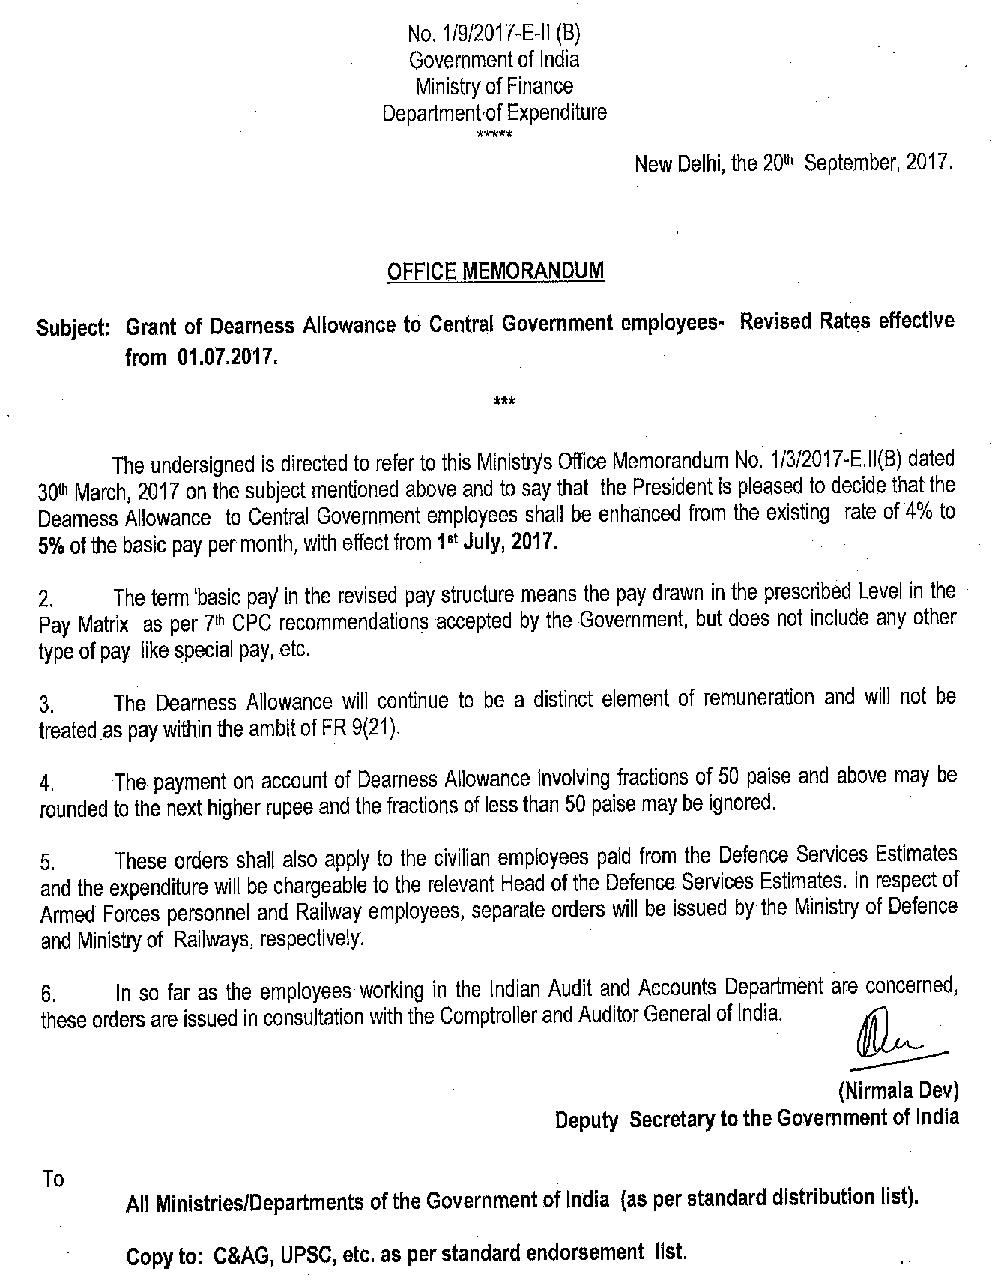 Dearness-Allowance-Central-Government-employees